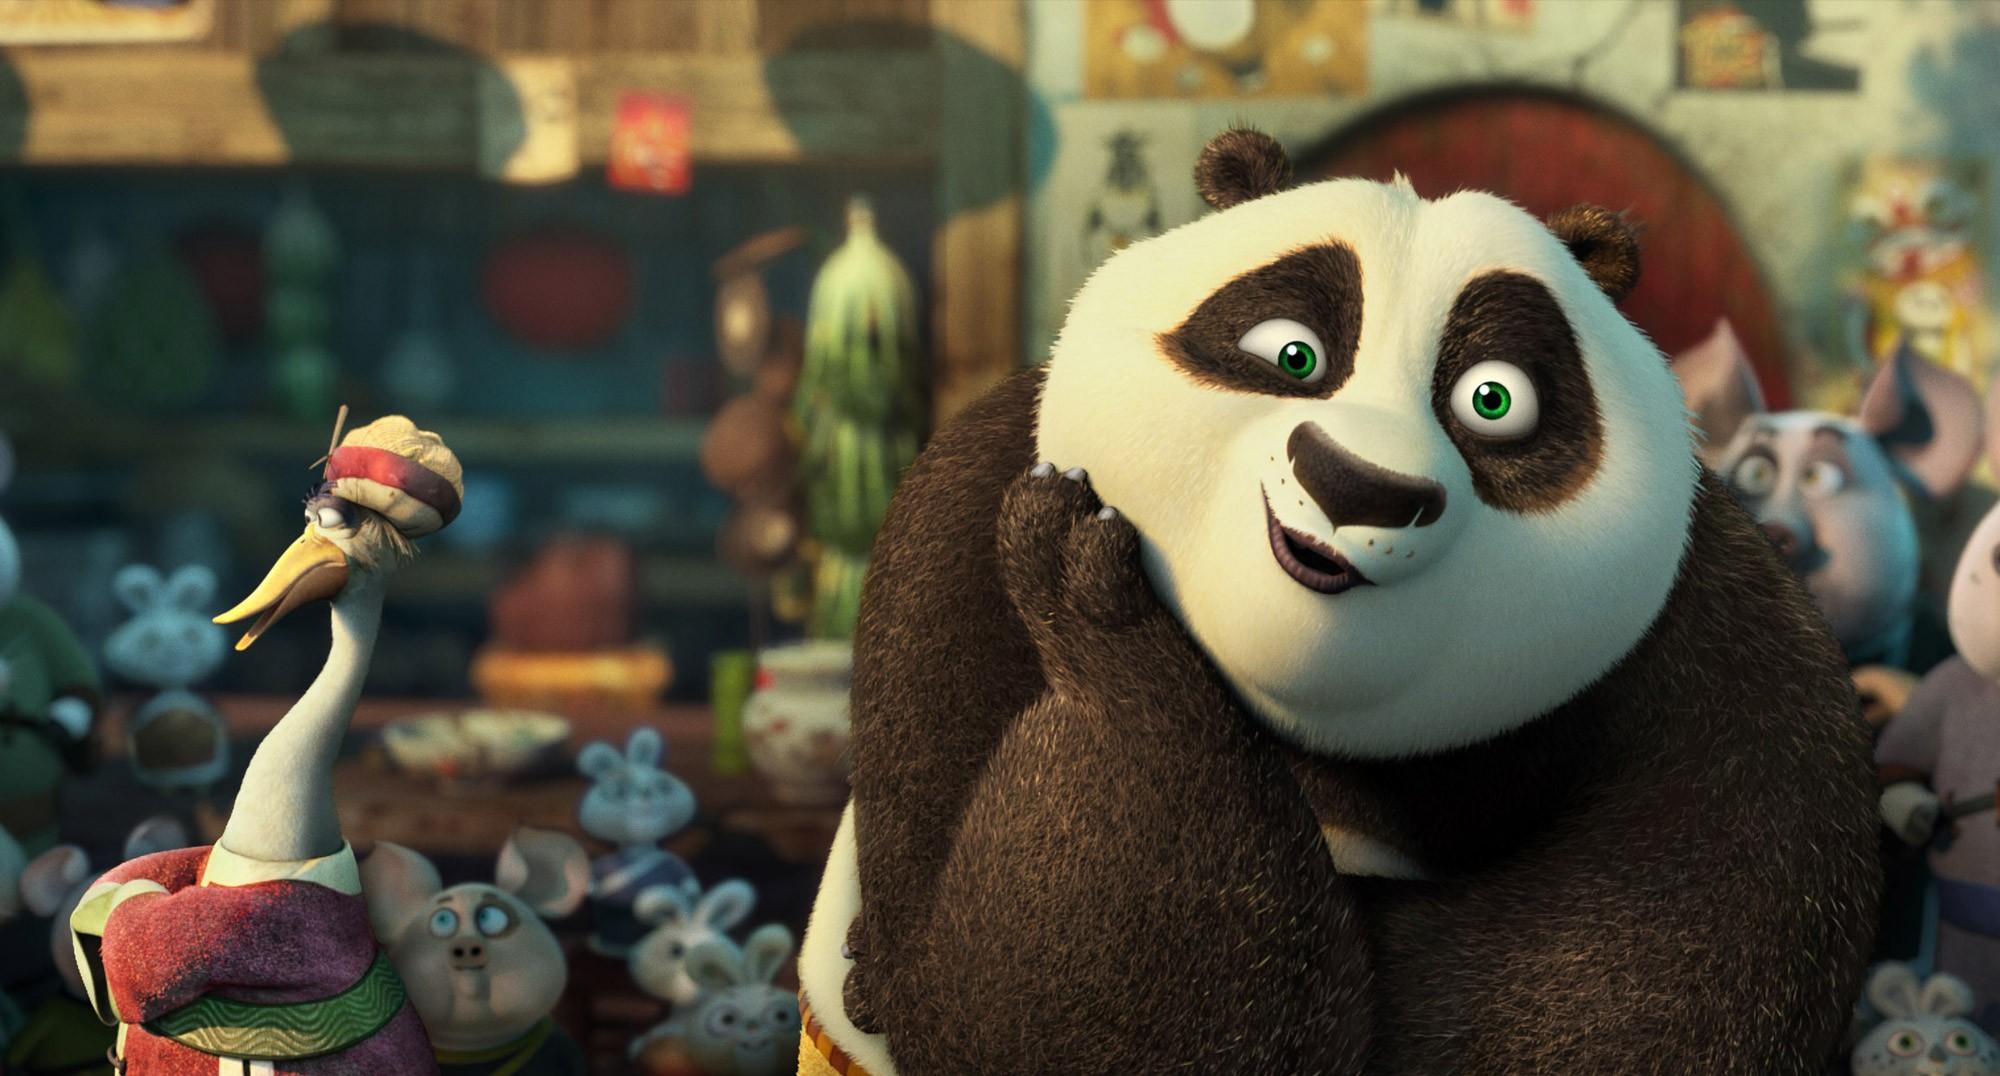 Kung fu panda 3 film gallery